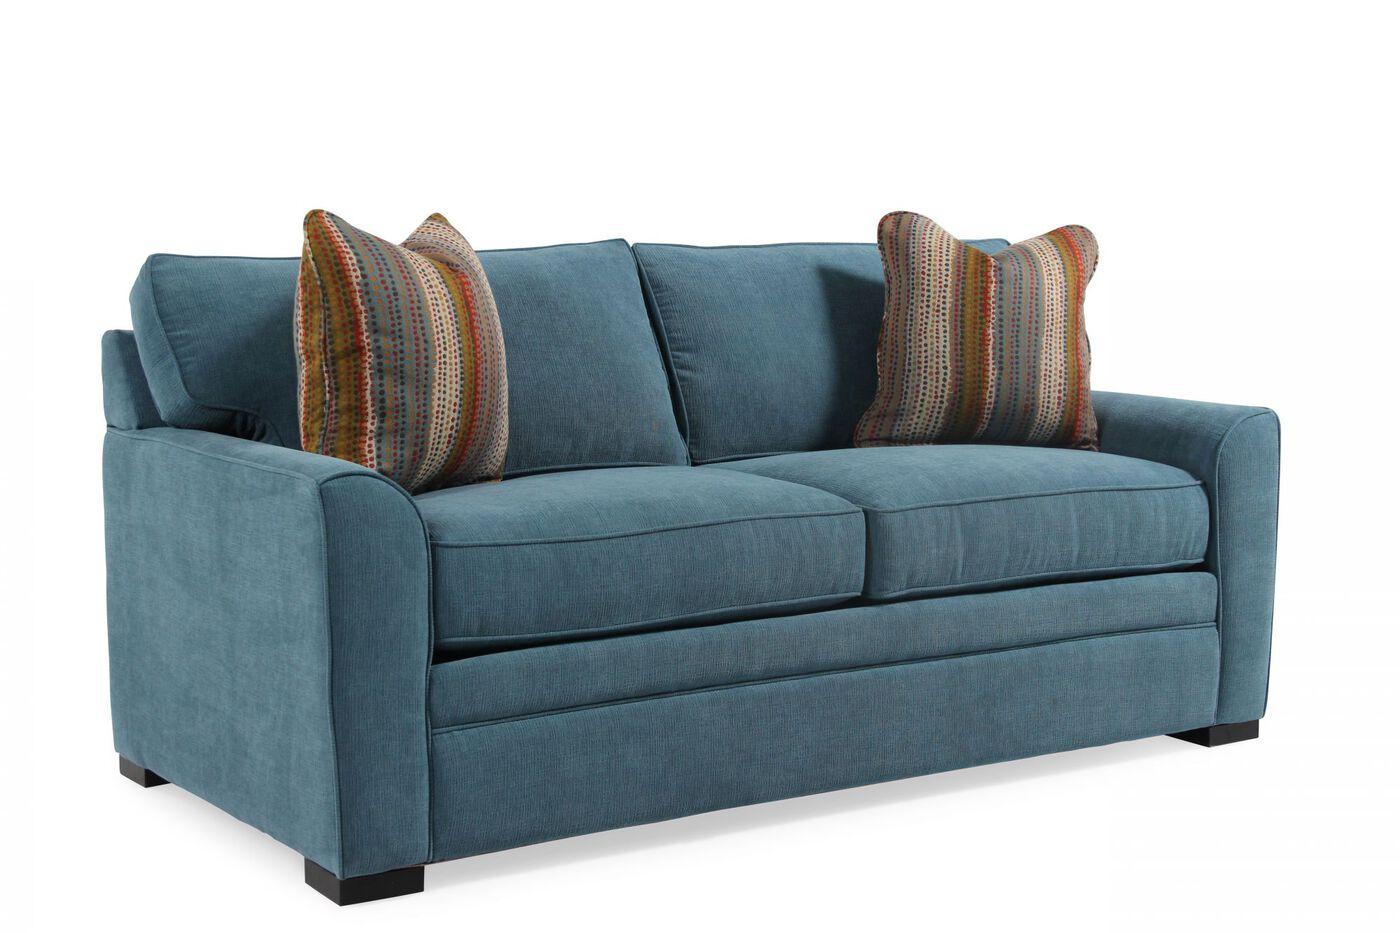 Jonathan Louis Blissful Blue Queen Memory Foam Sleeper Sofa